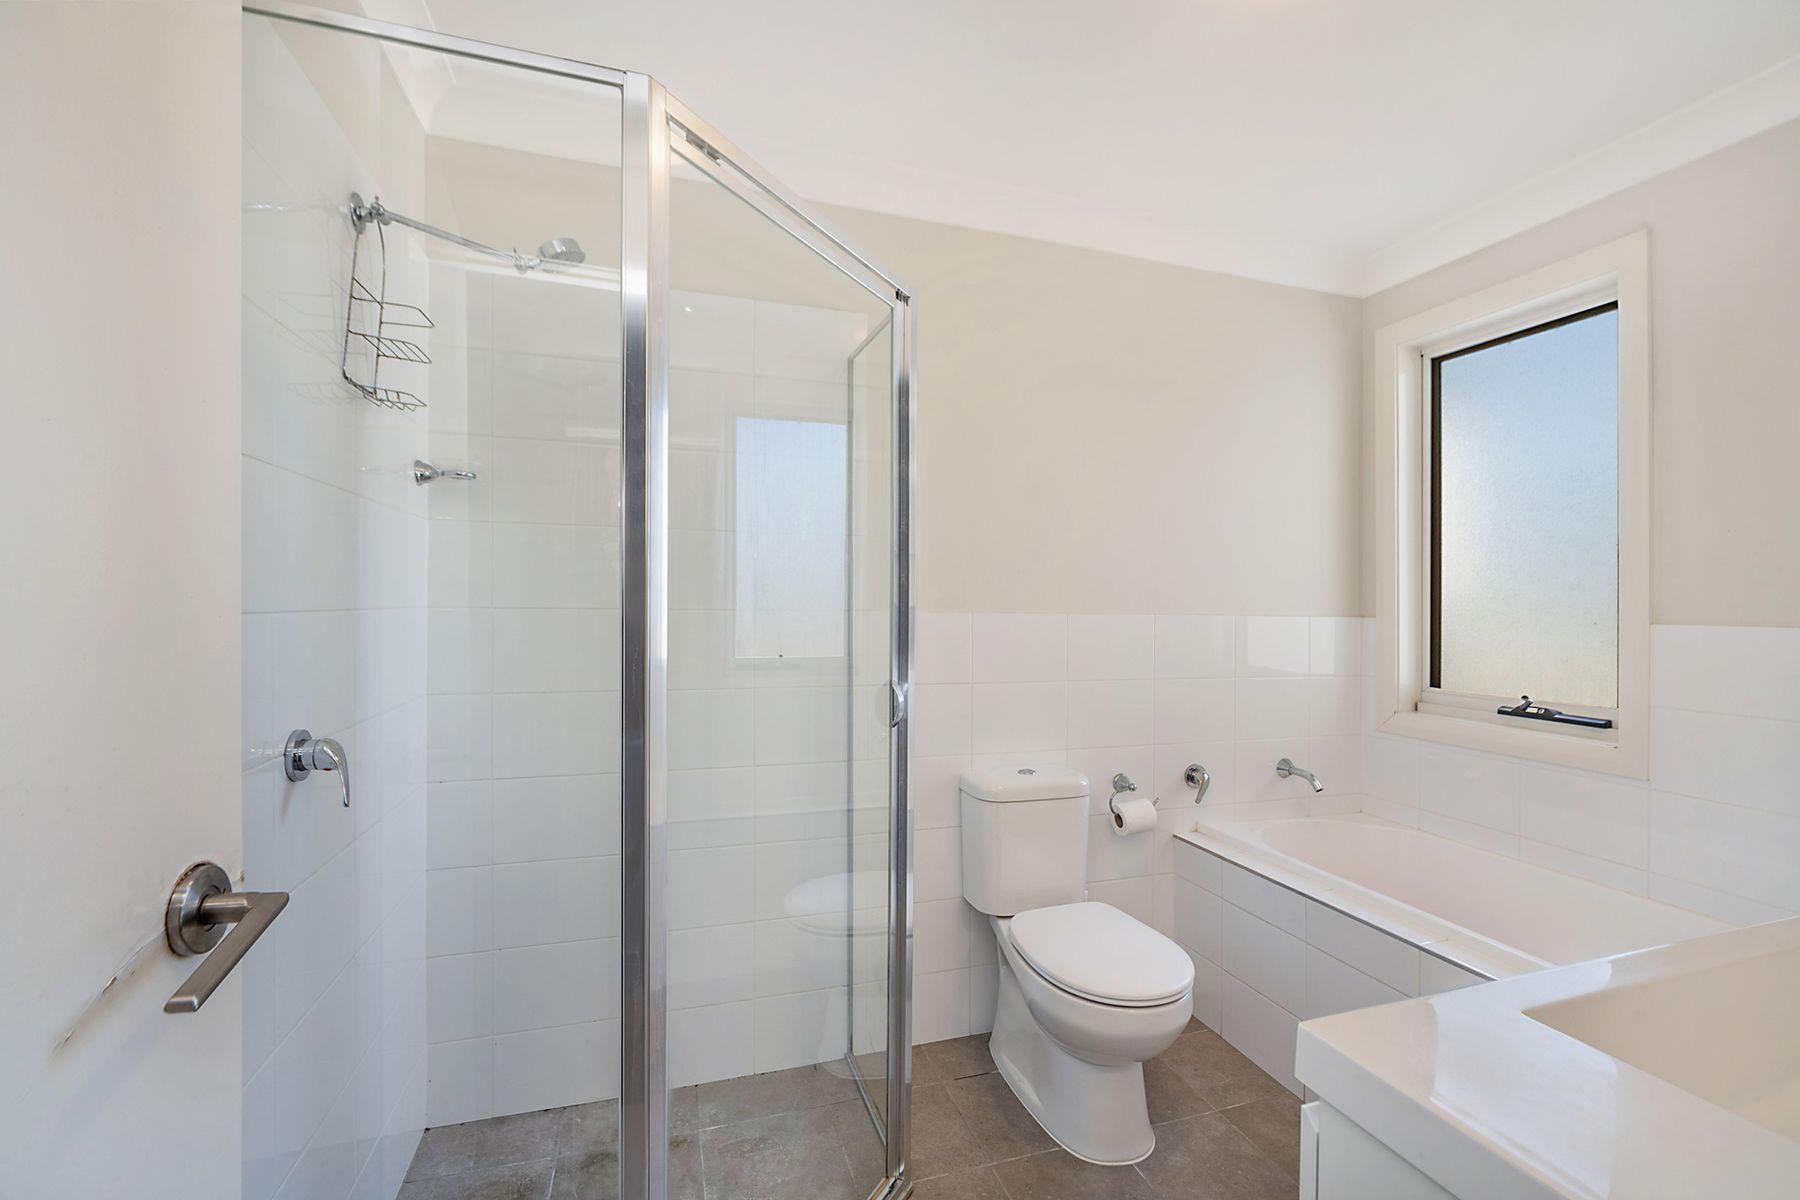 5/1 Longworth Avenue, Wallsend, NSW 2287